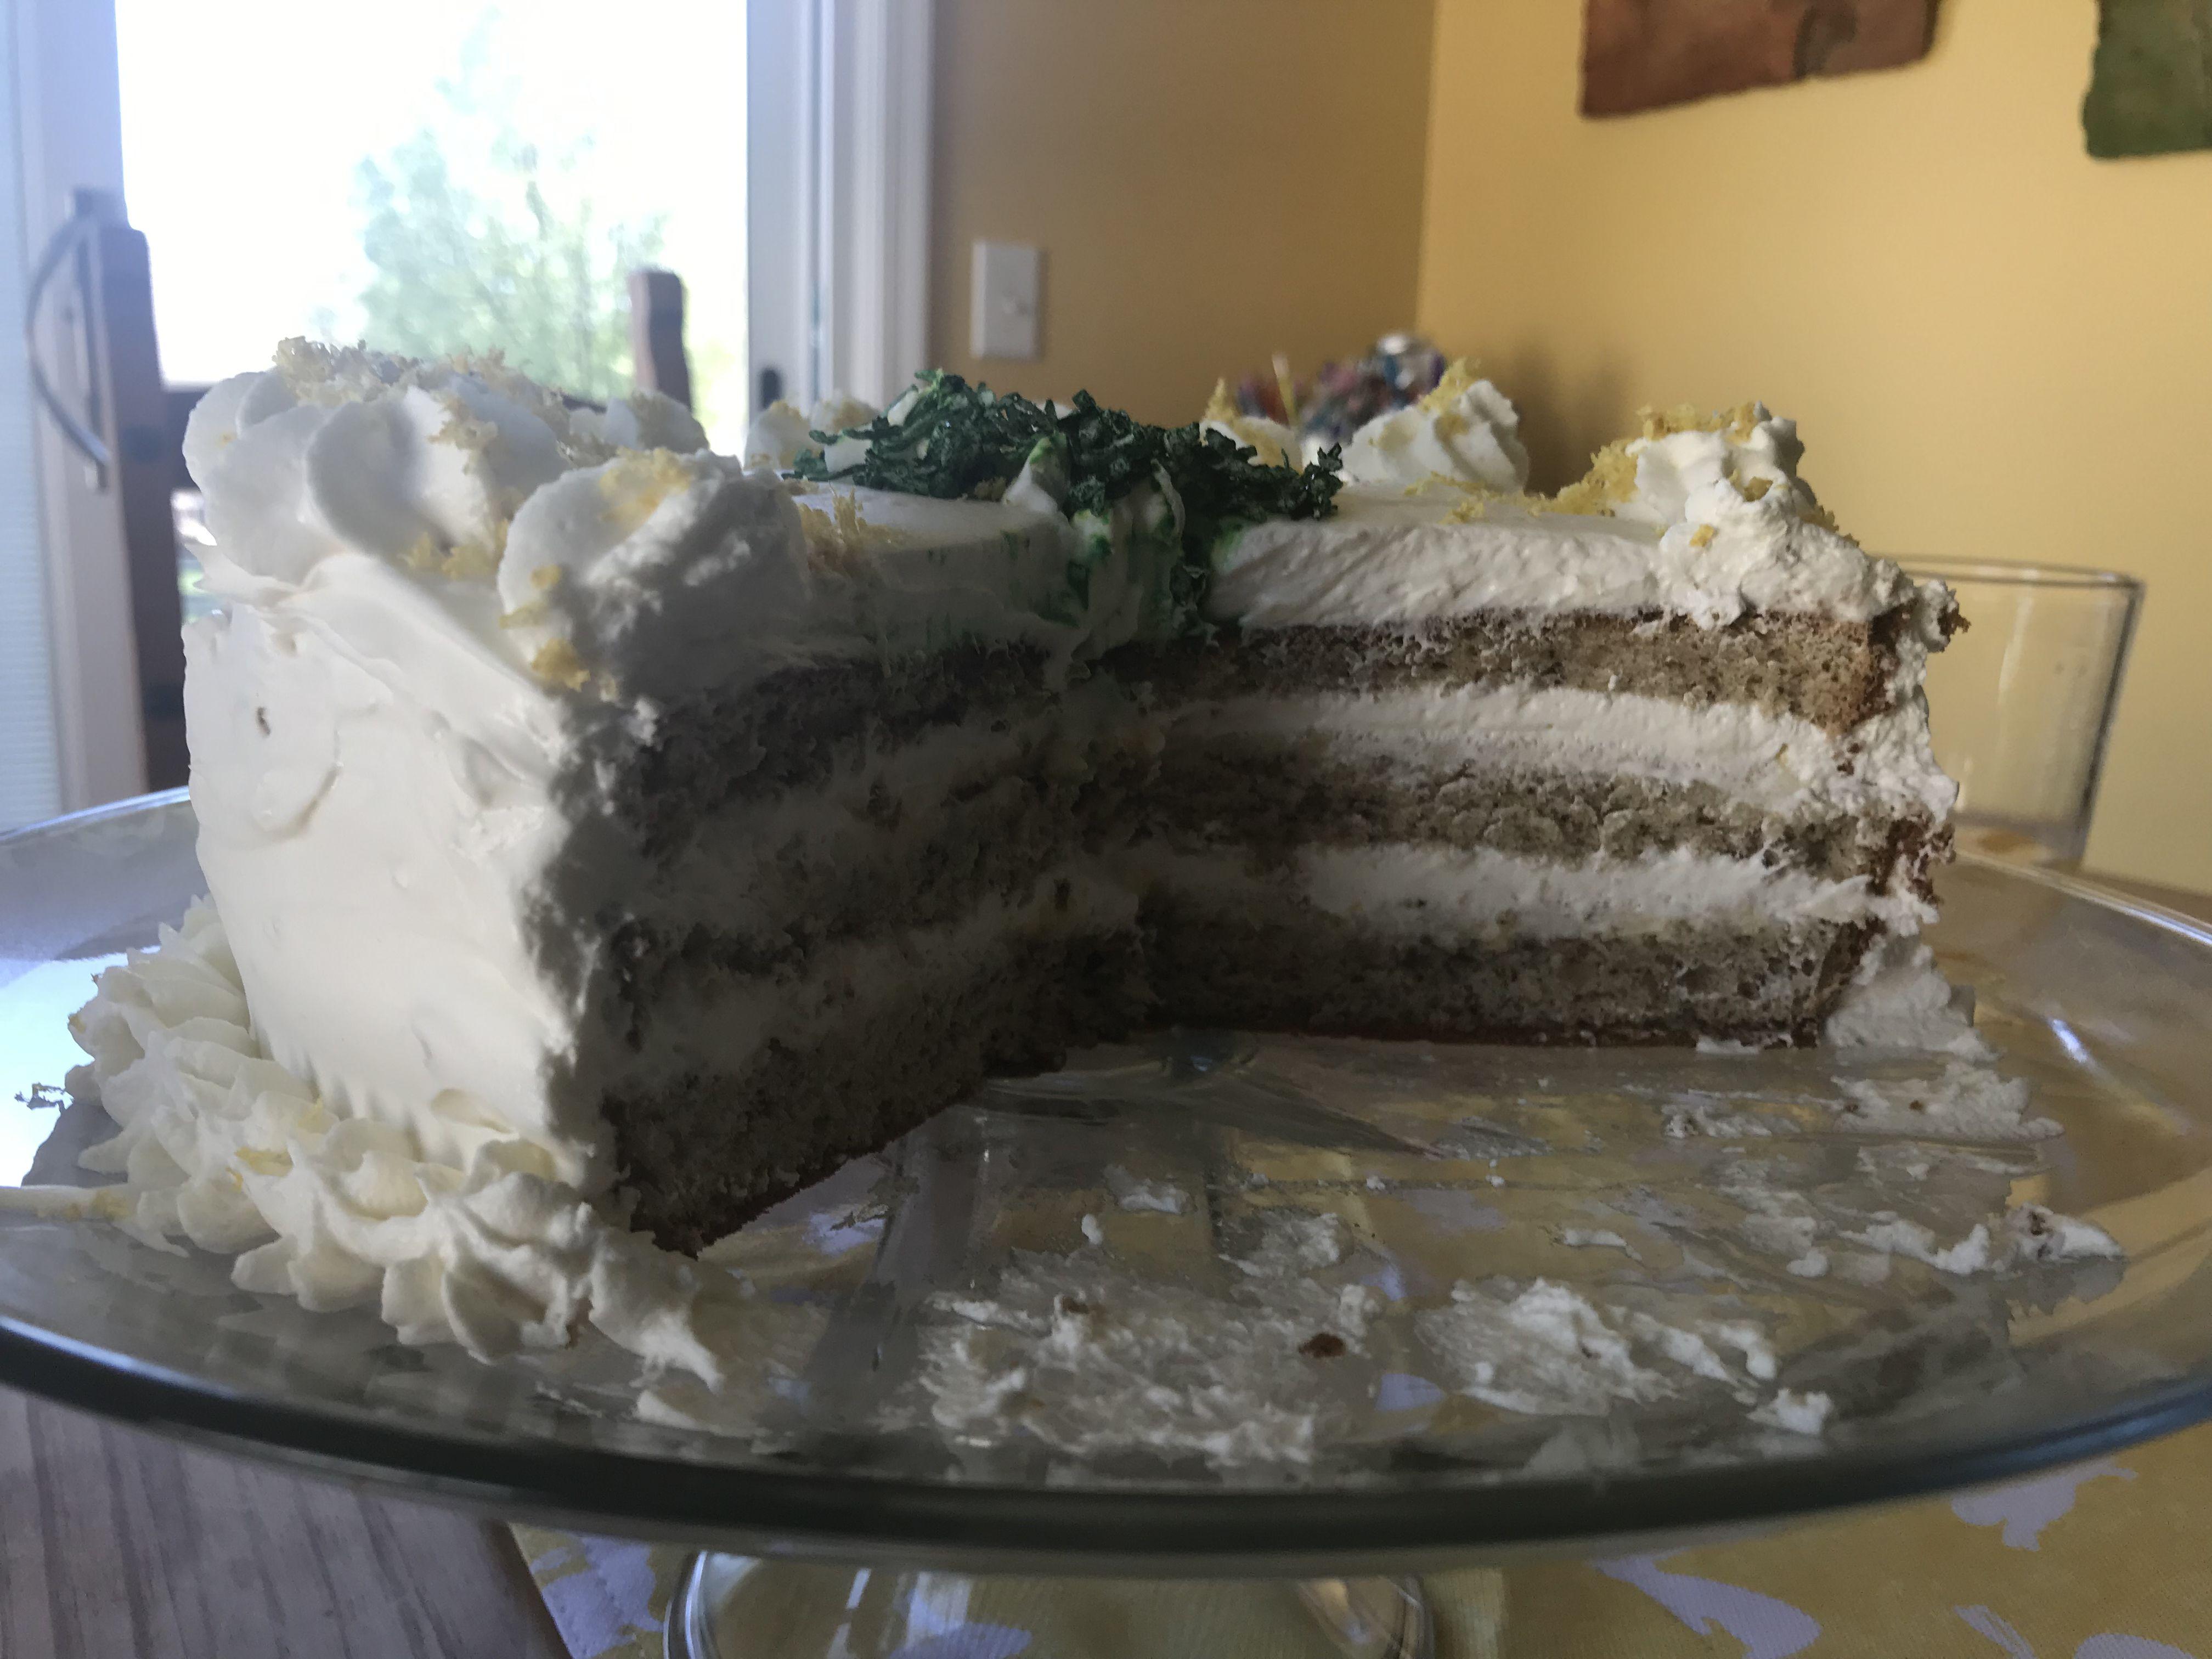 Lemon curd Cake Decorating Photos